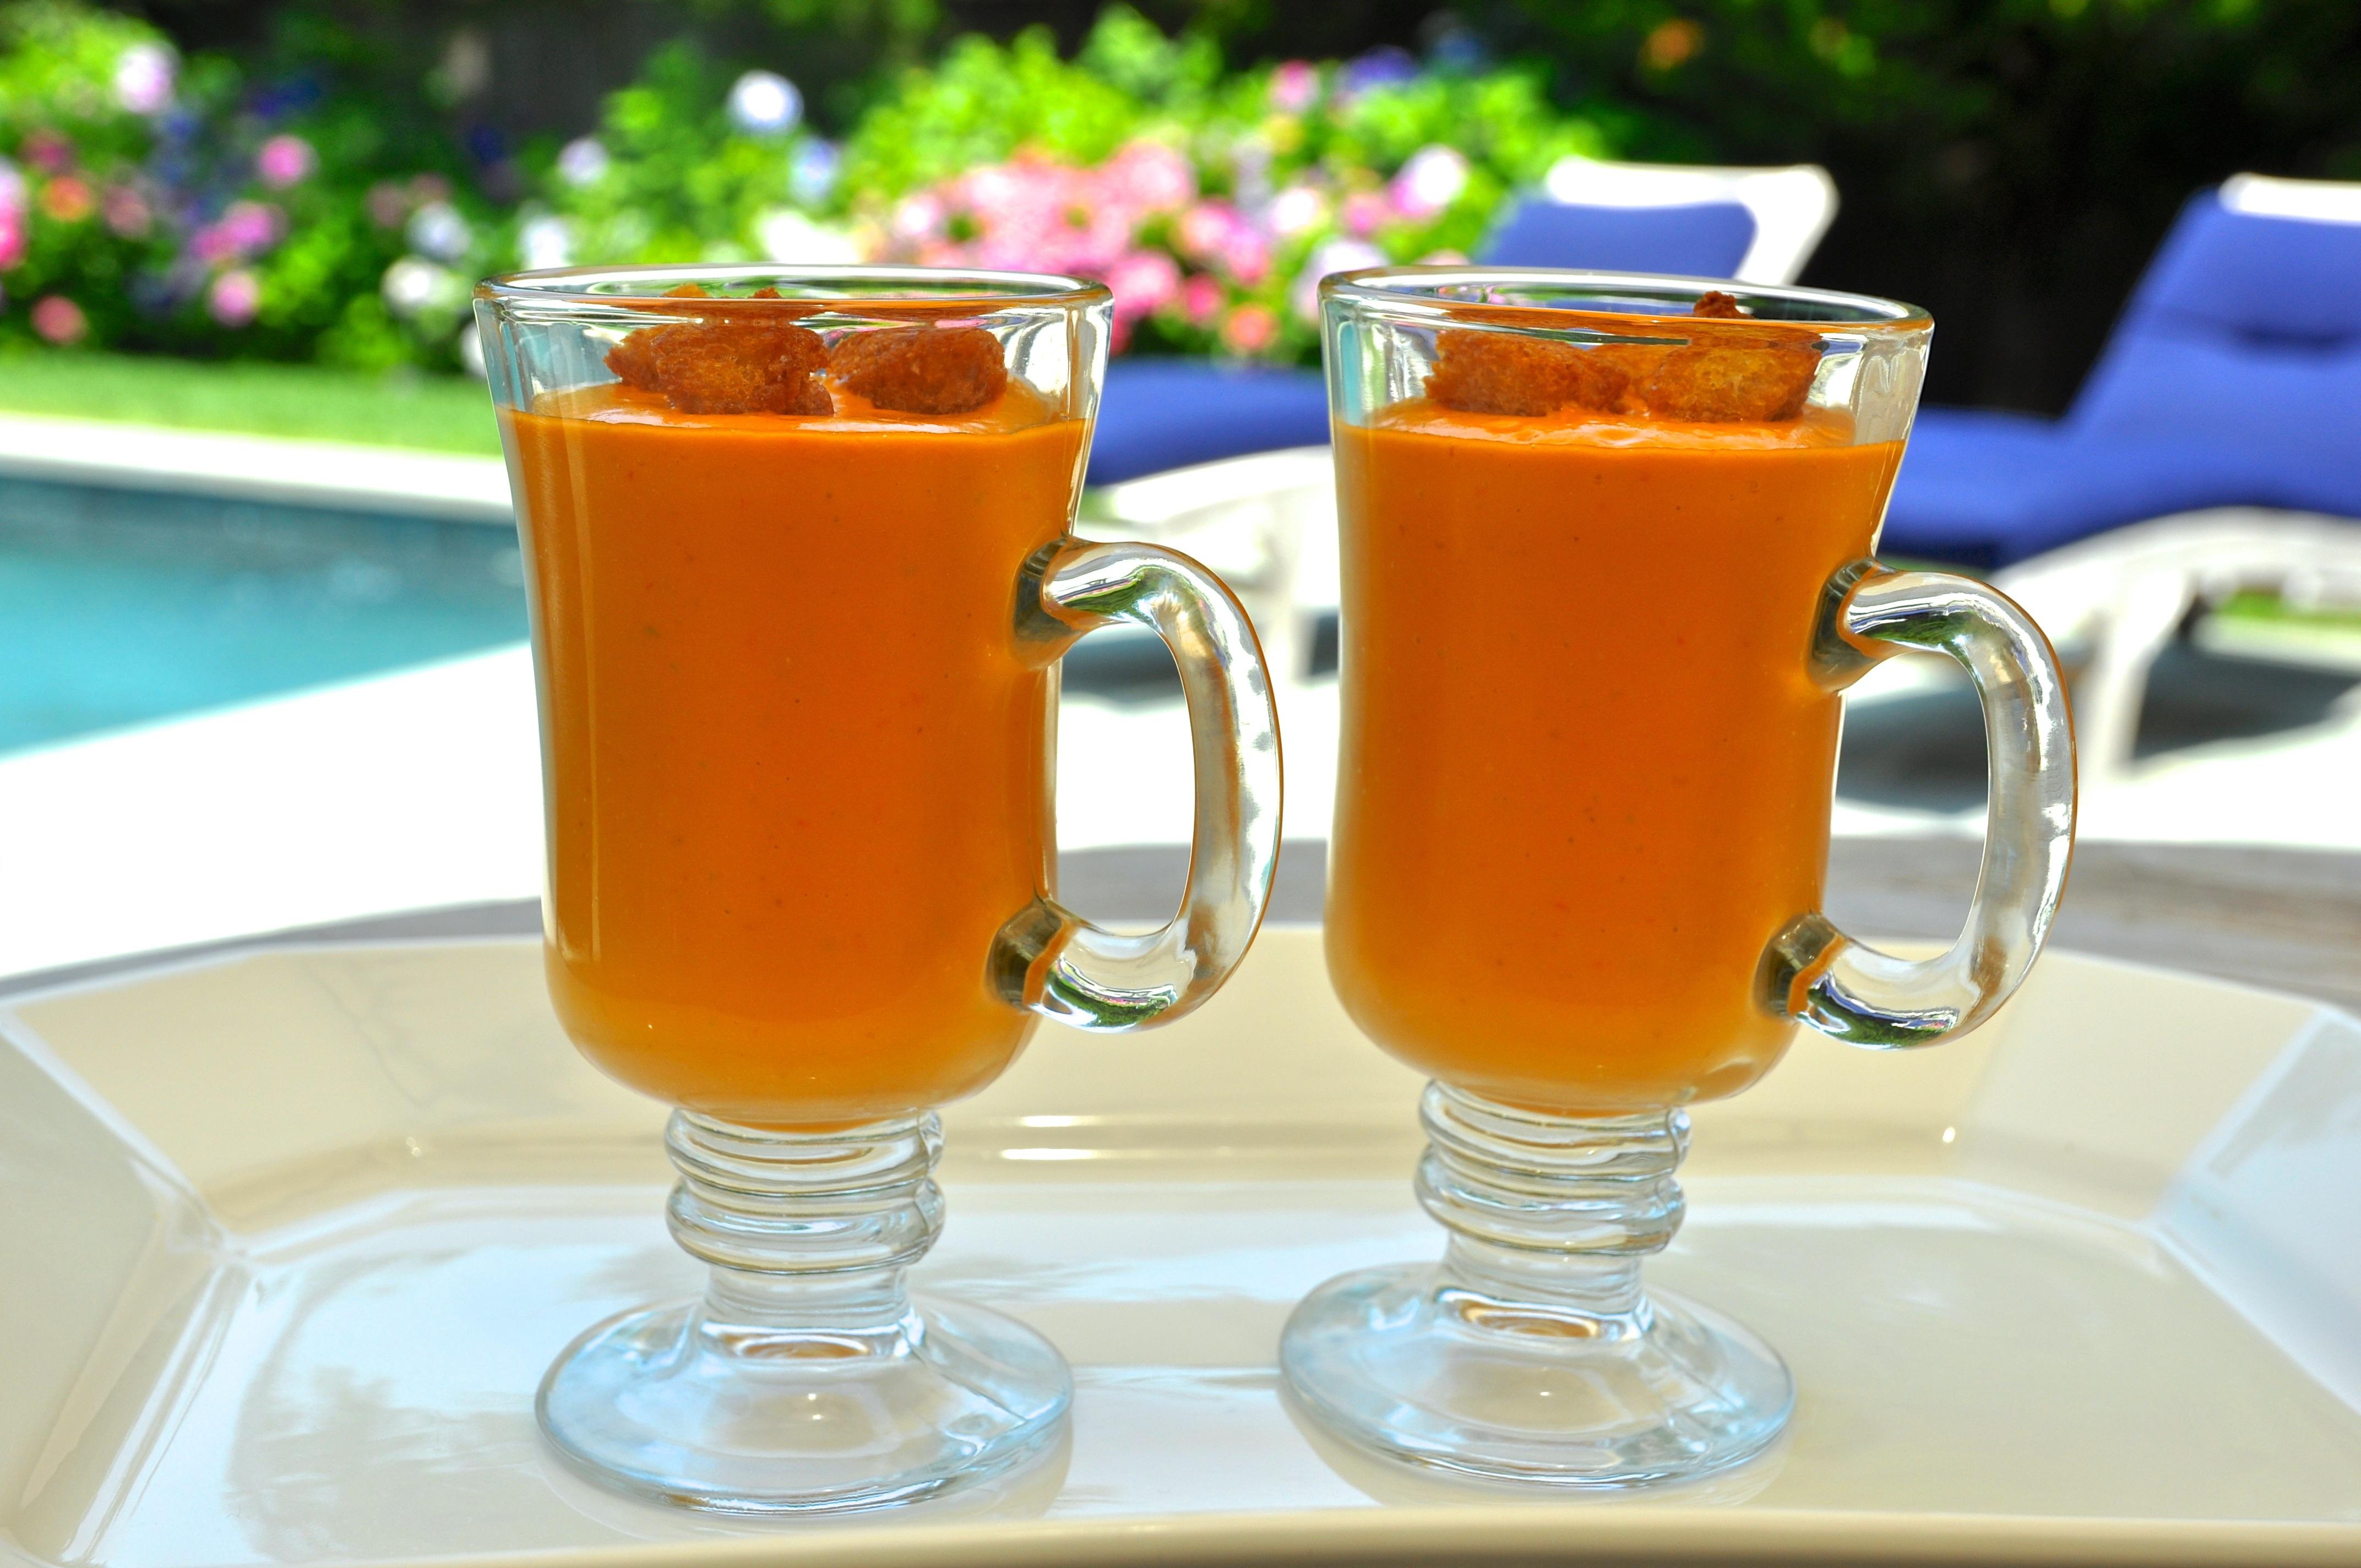 Creamy Gazpacho Andrea Reiser